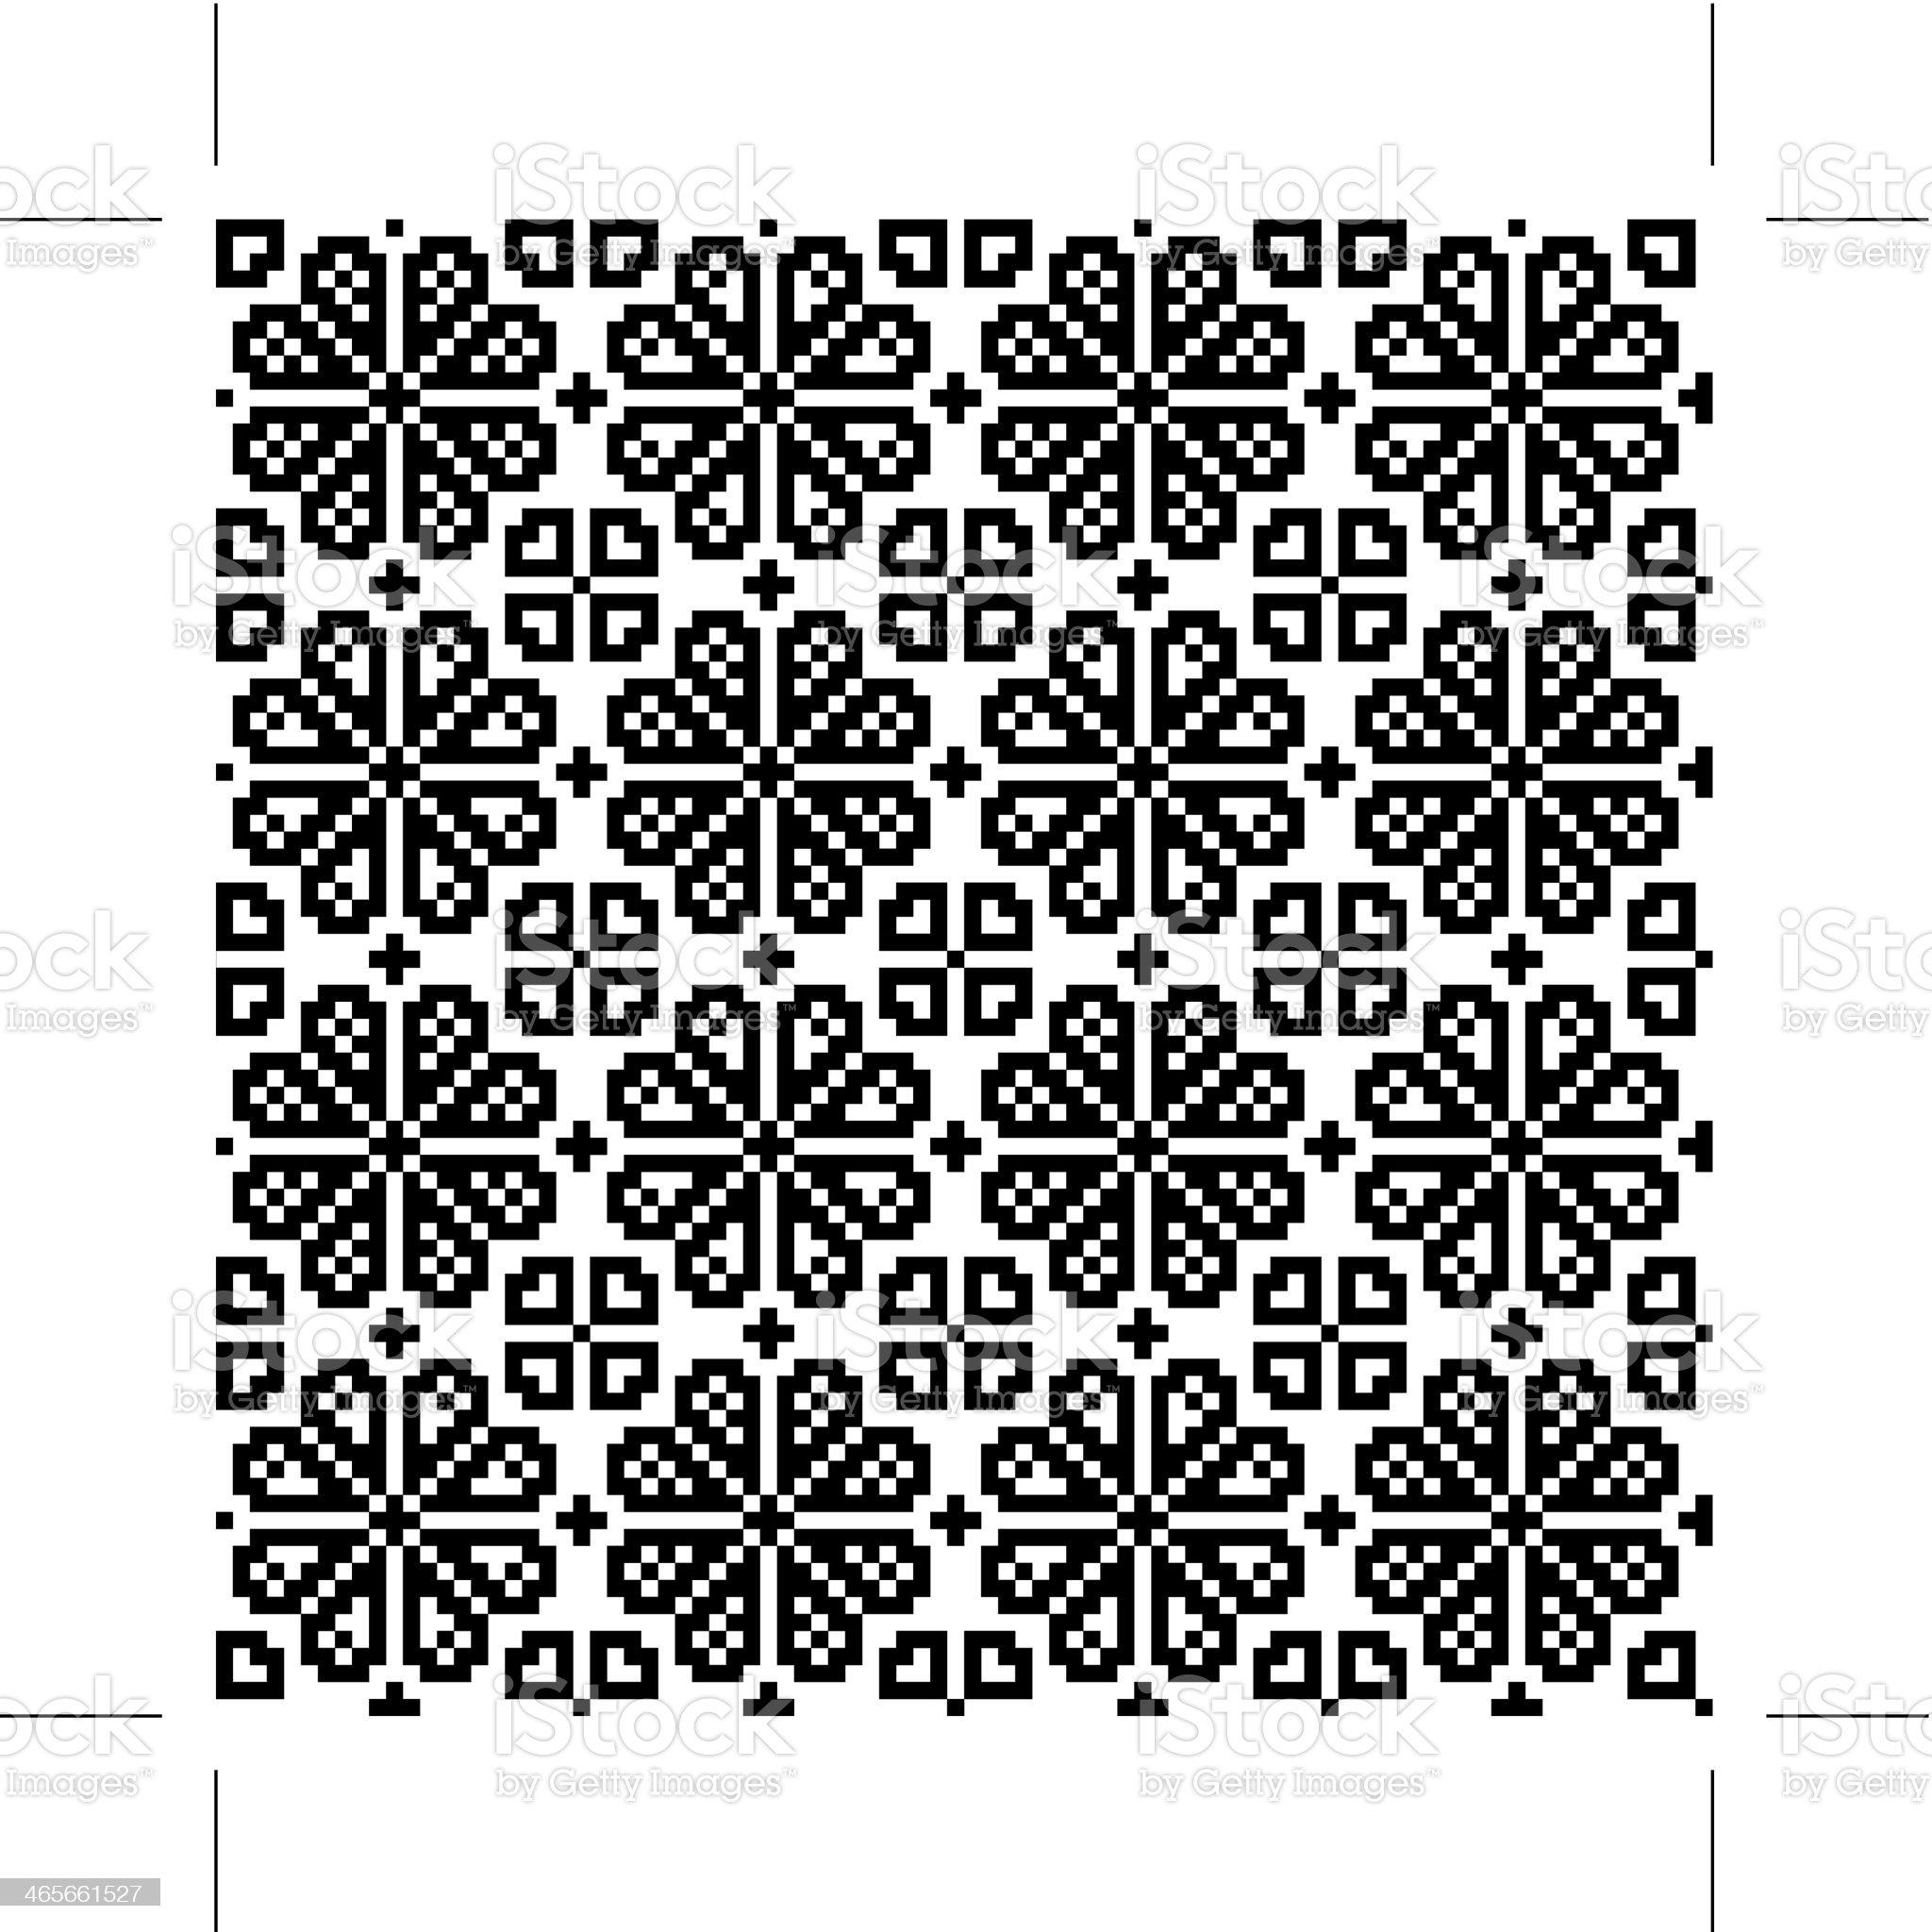 Geometrical flower seamless pattern royalty-free stock vector art